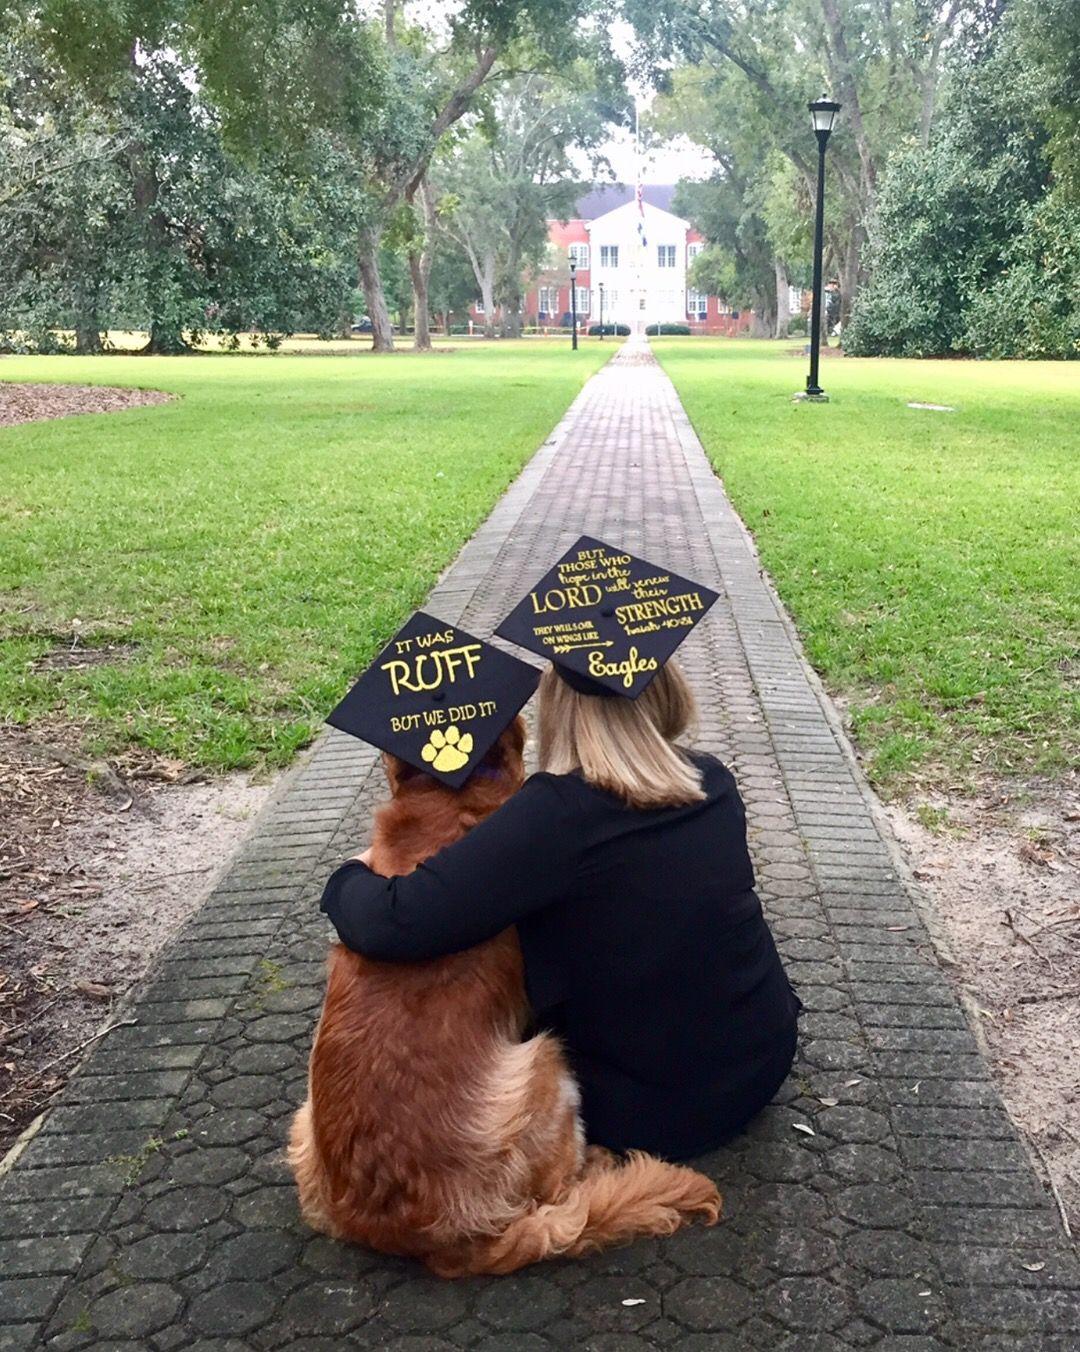 Gsu Graduation 2020.Graduation Dog Gsu 2020 Is Coming College Graduation